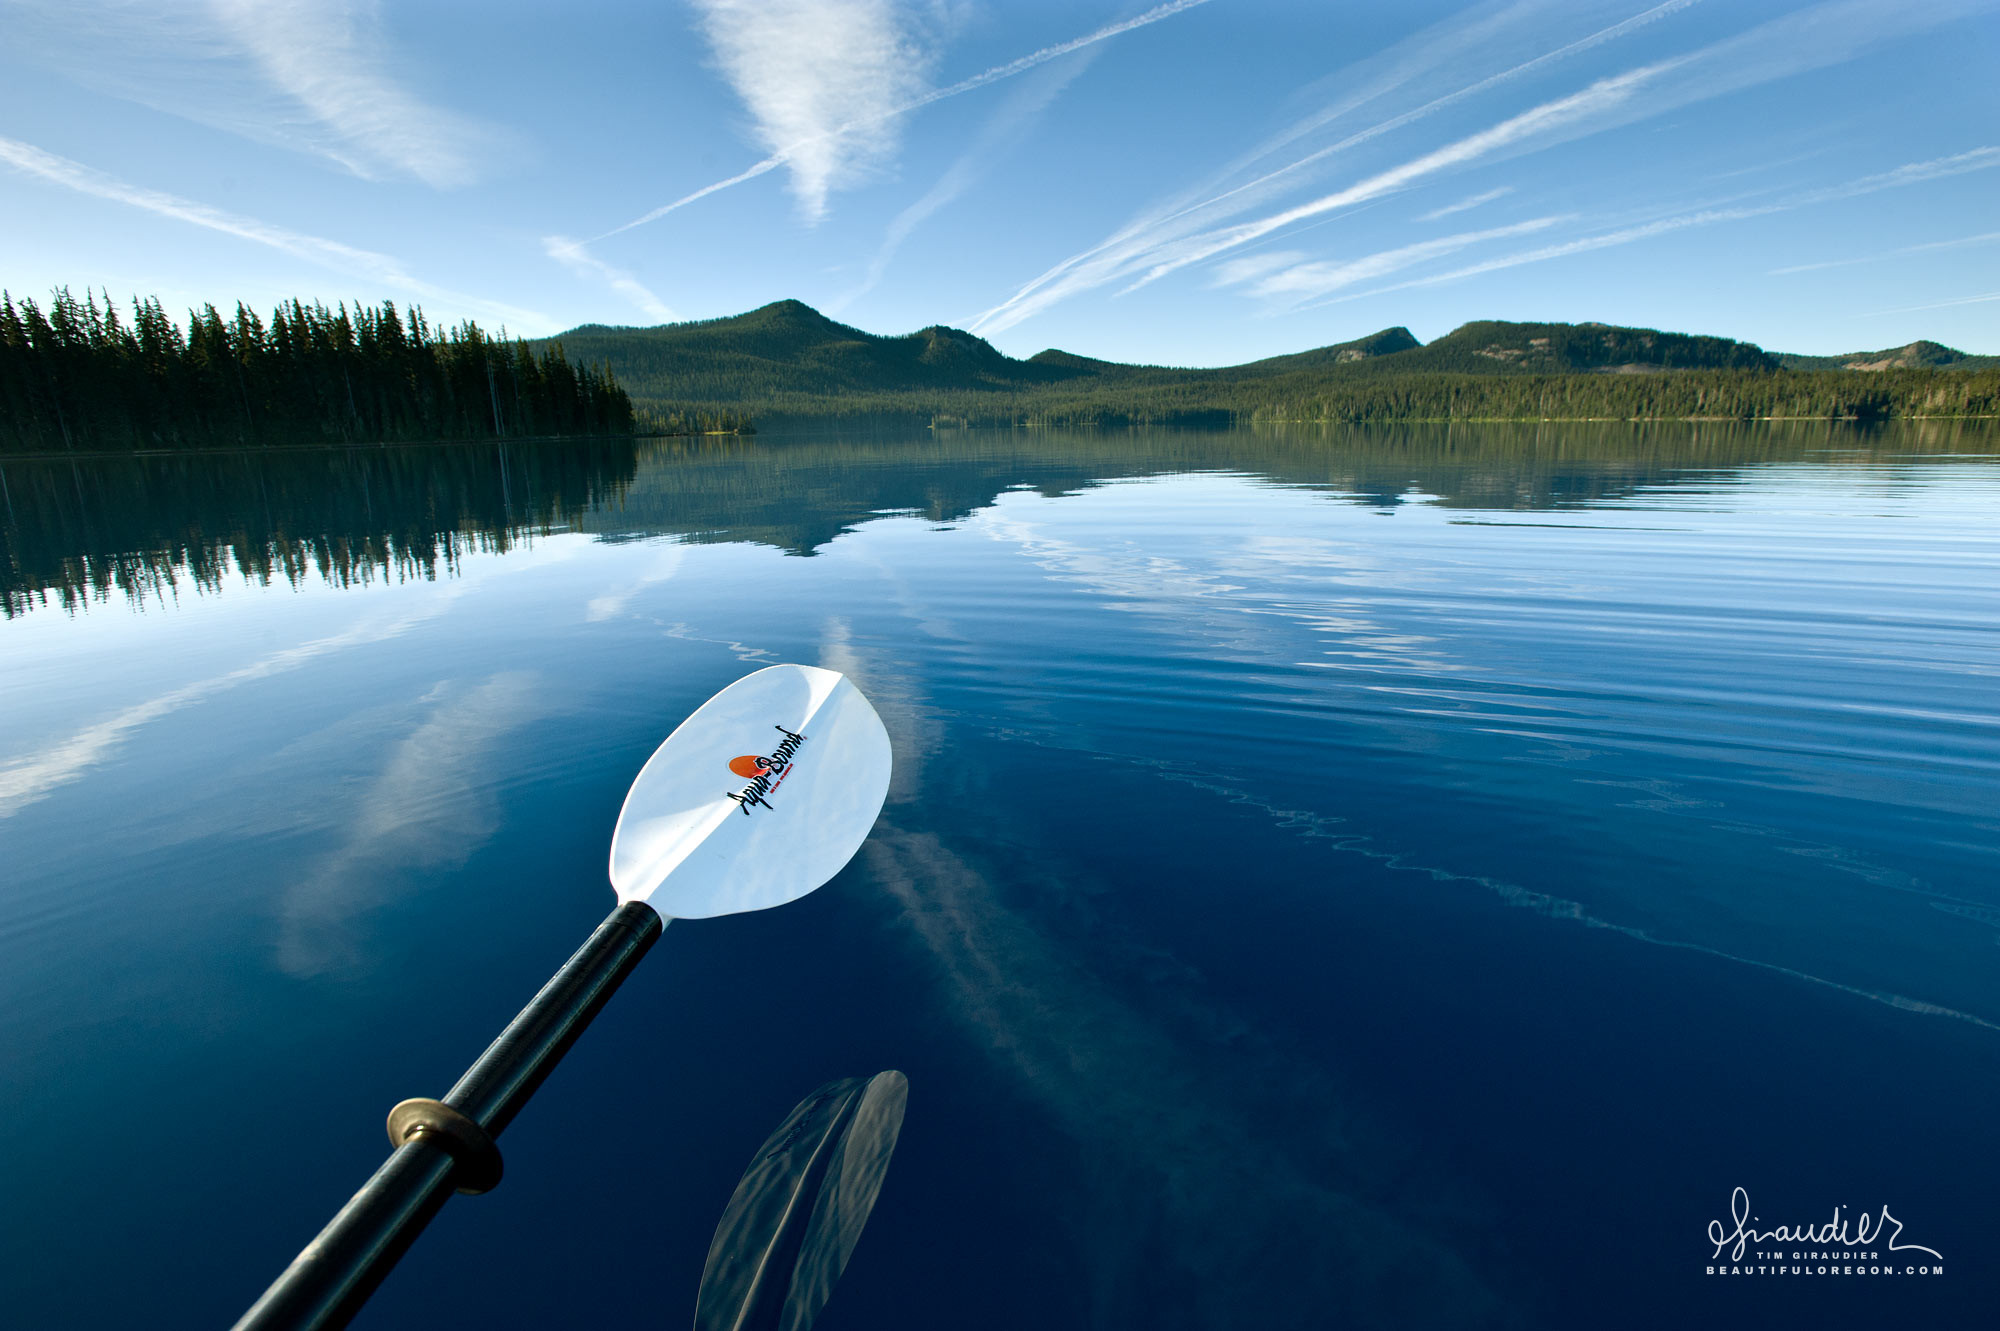 Kayak paddling Waldo Lake. Willamette National Forest, Central Oregon Cascades.